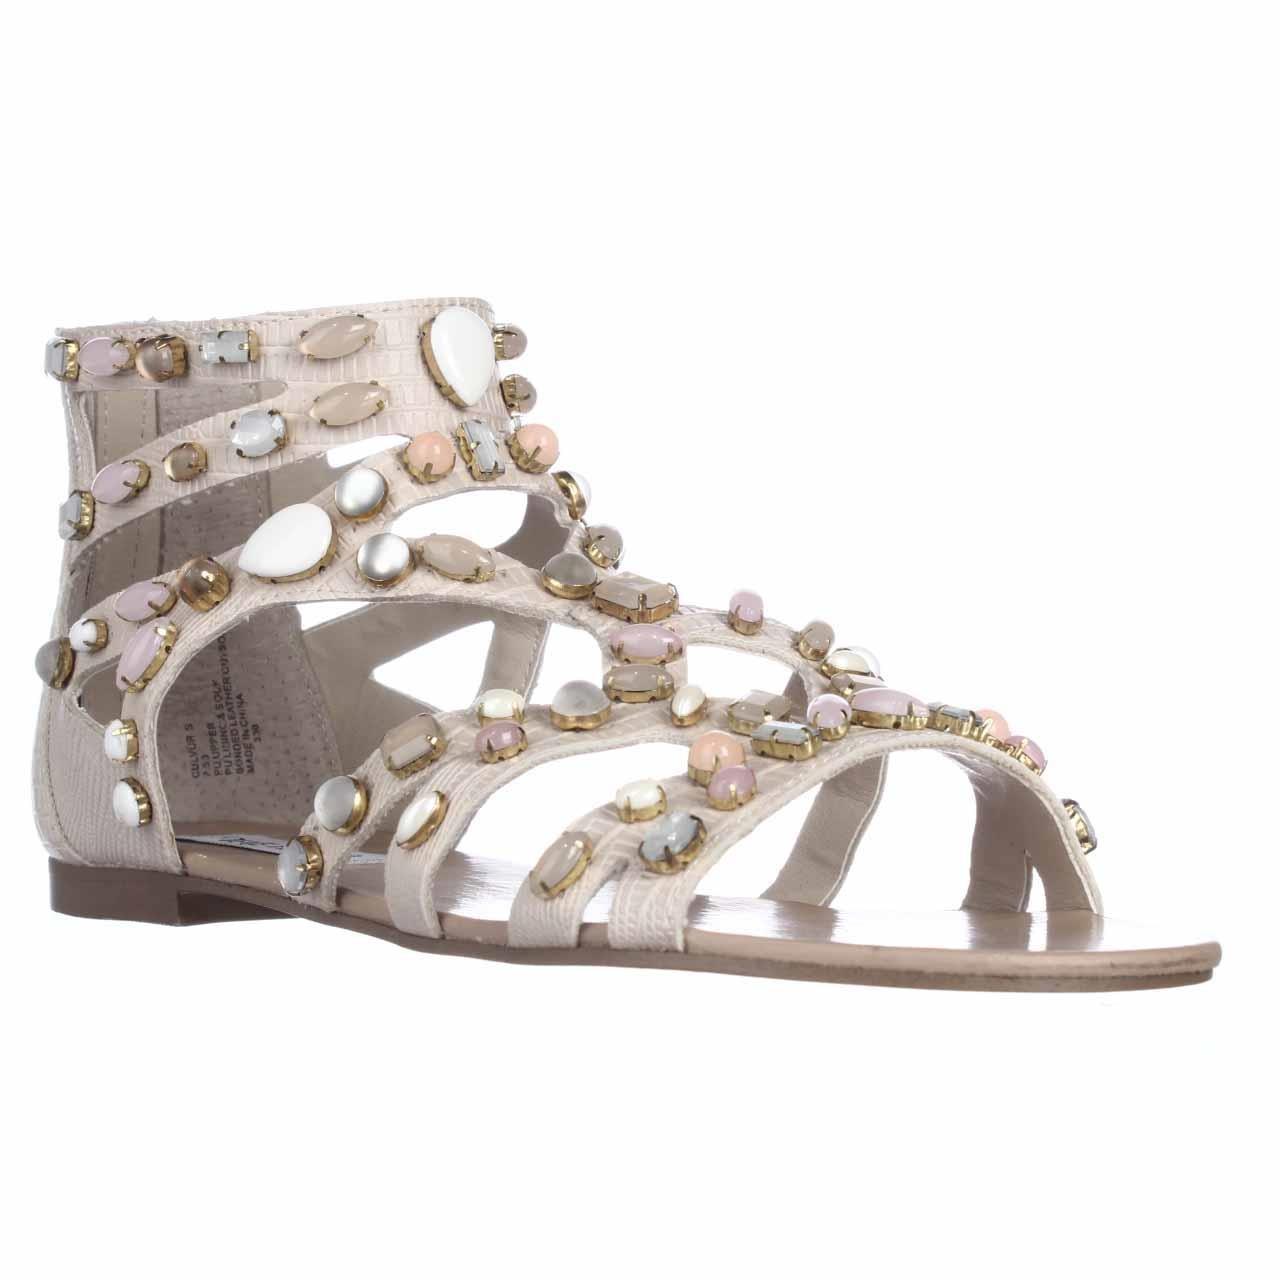 68534b44d5c51e Lyst - Steve Madden Culver Jeweled Gladiator Flat Sandals in White